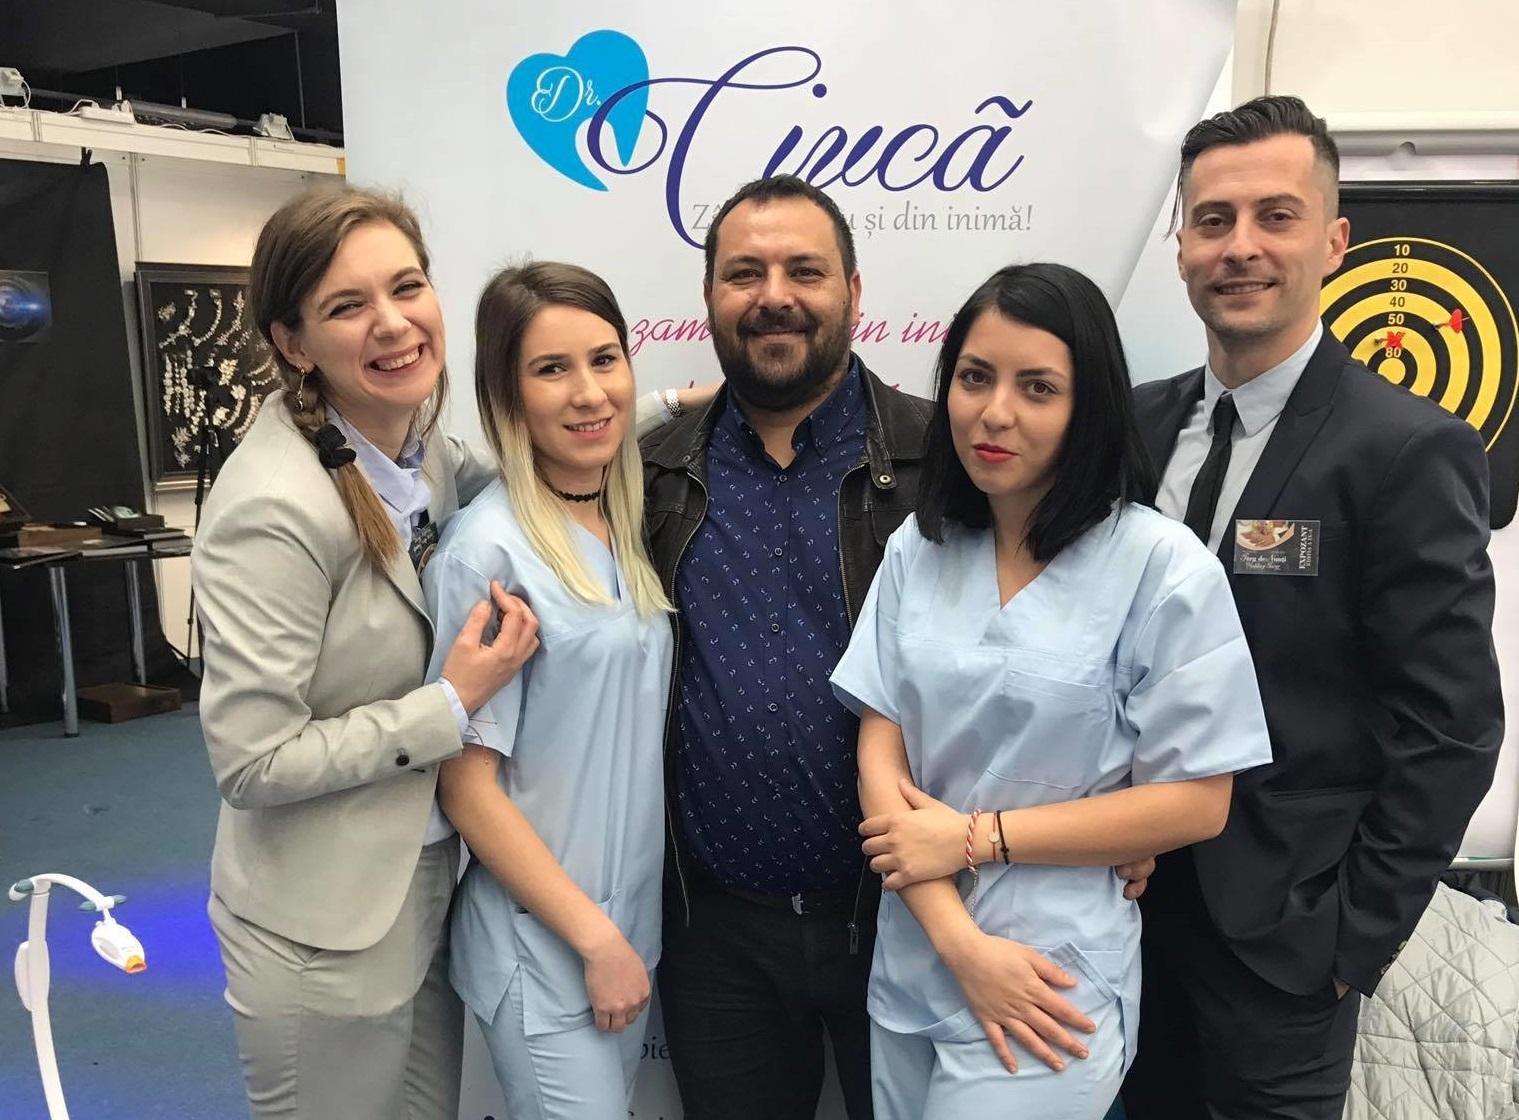 Parteneriat cu Cabinet Dr.Ciuca